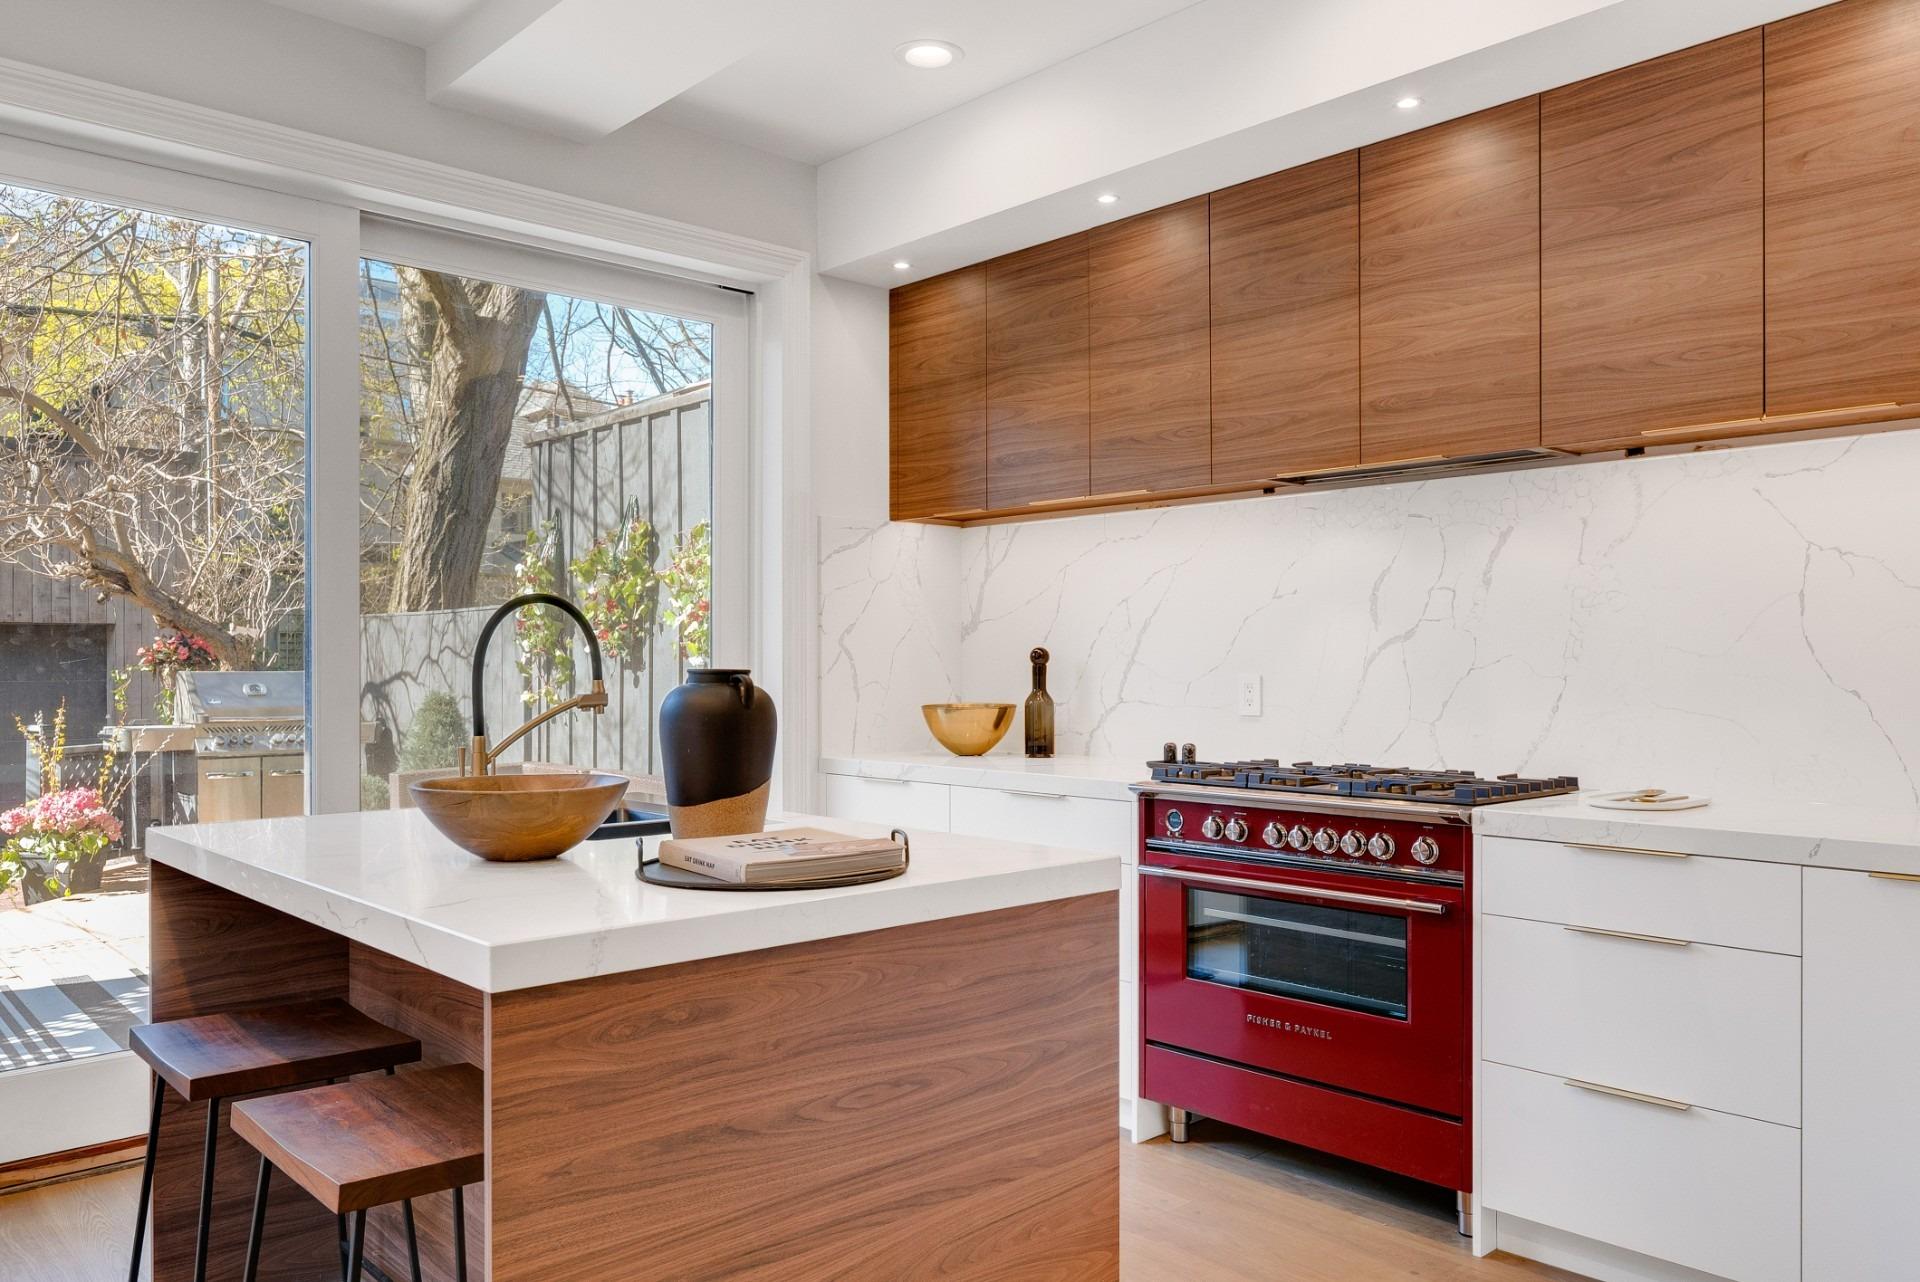 Kitchen Remodeling Santa Ana